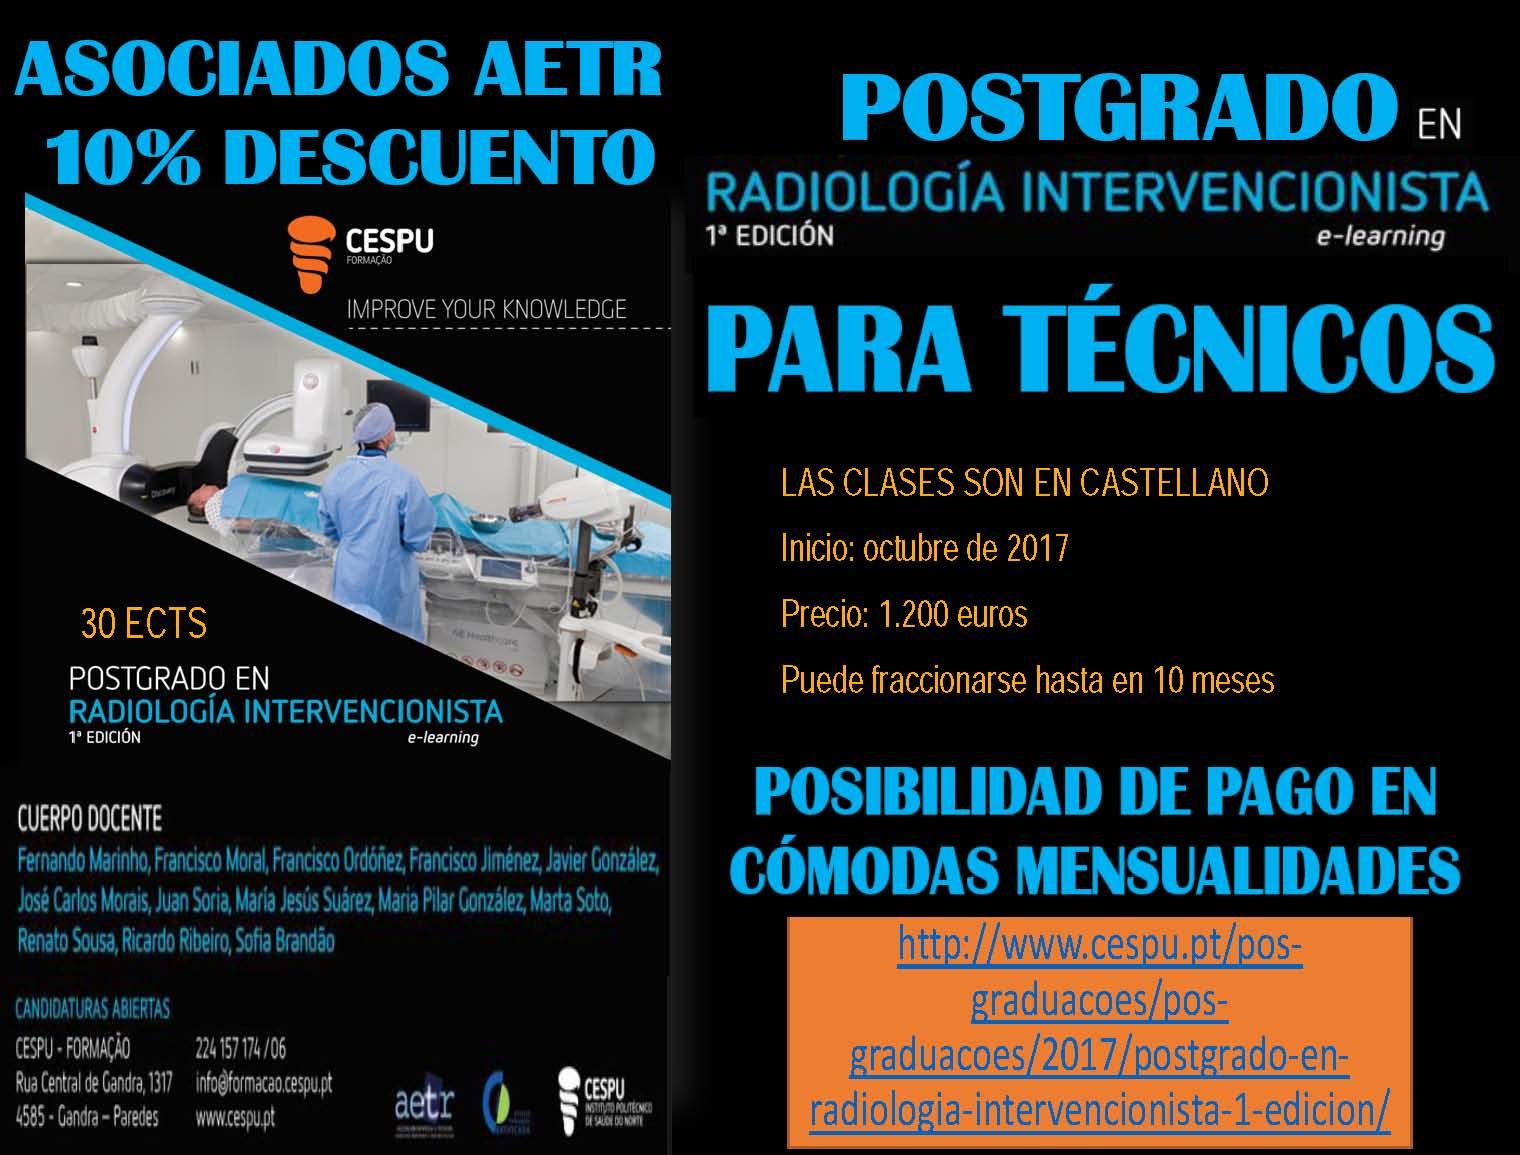 CURSO-POSTGRADO-AETR-CESPU-VASCULAR-INTERVENCIONISTA